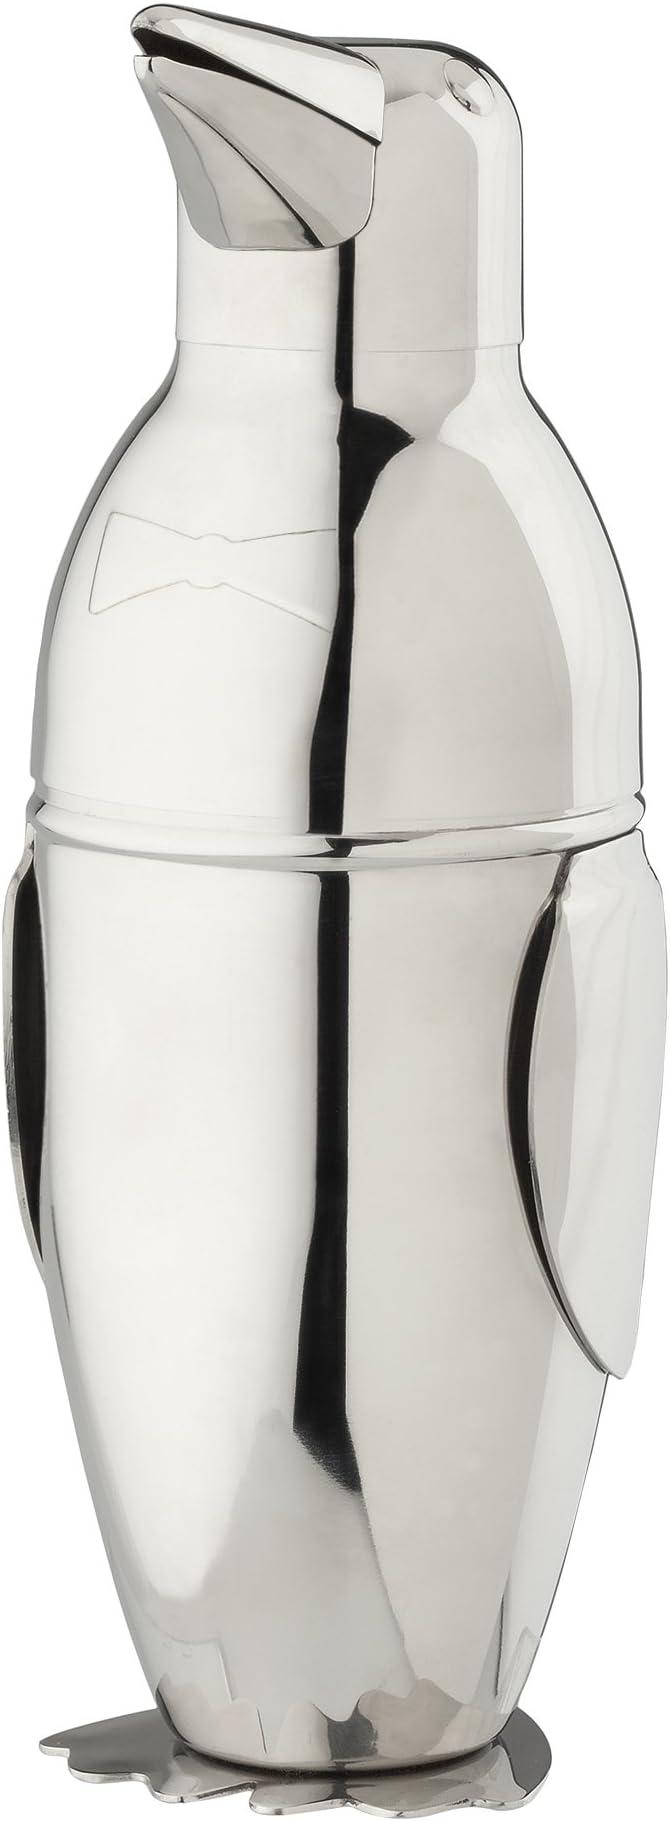 HIC Penguin Cocktail Shaker